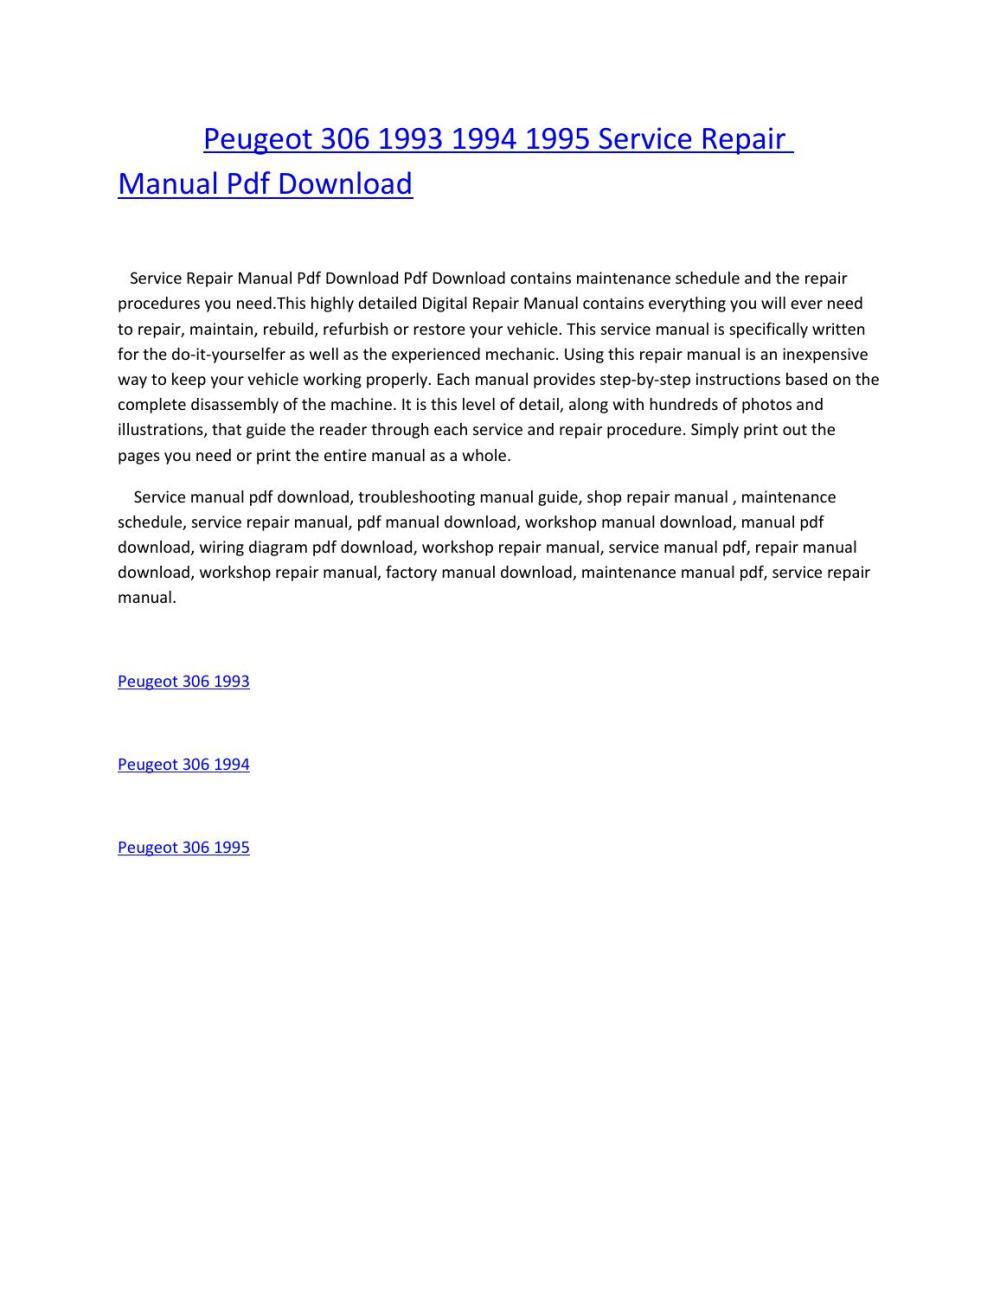 medium resolution of peugeot 306 1993 1994 1995 service repair manual pdf download by amurgului issuu